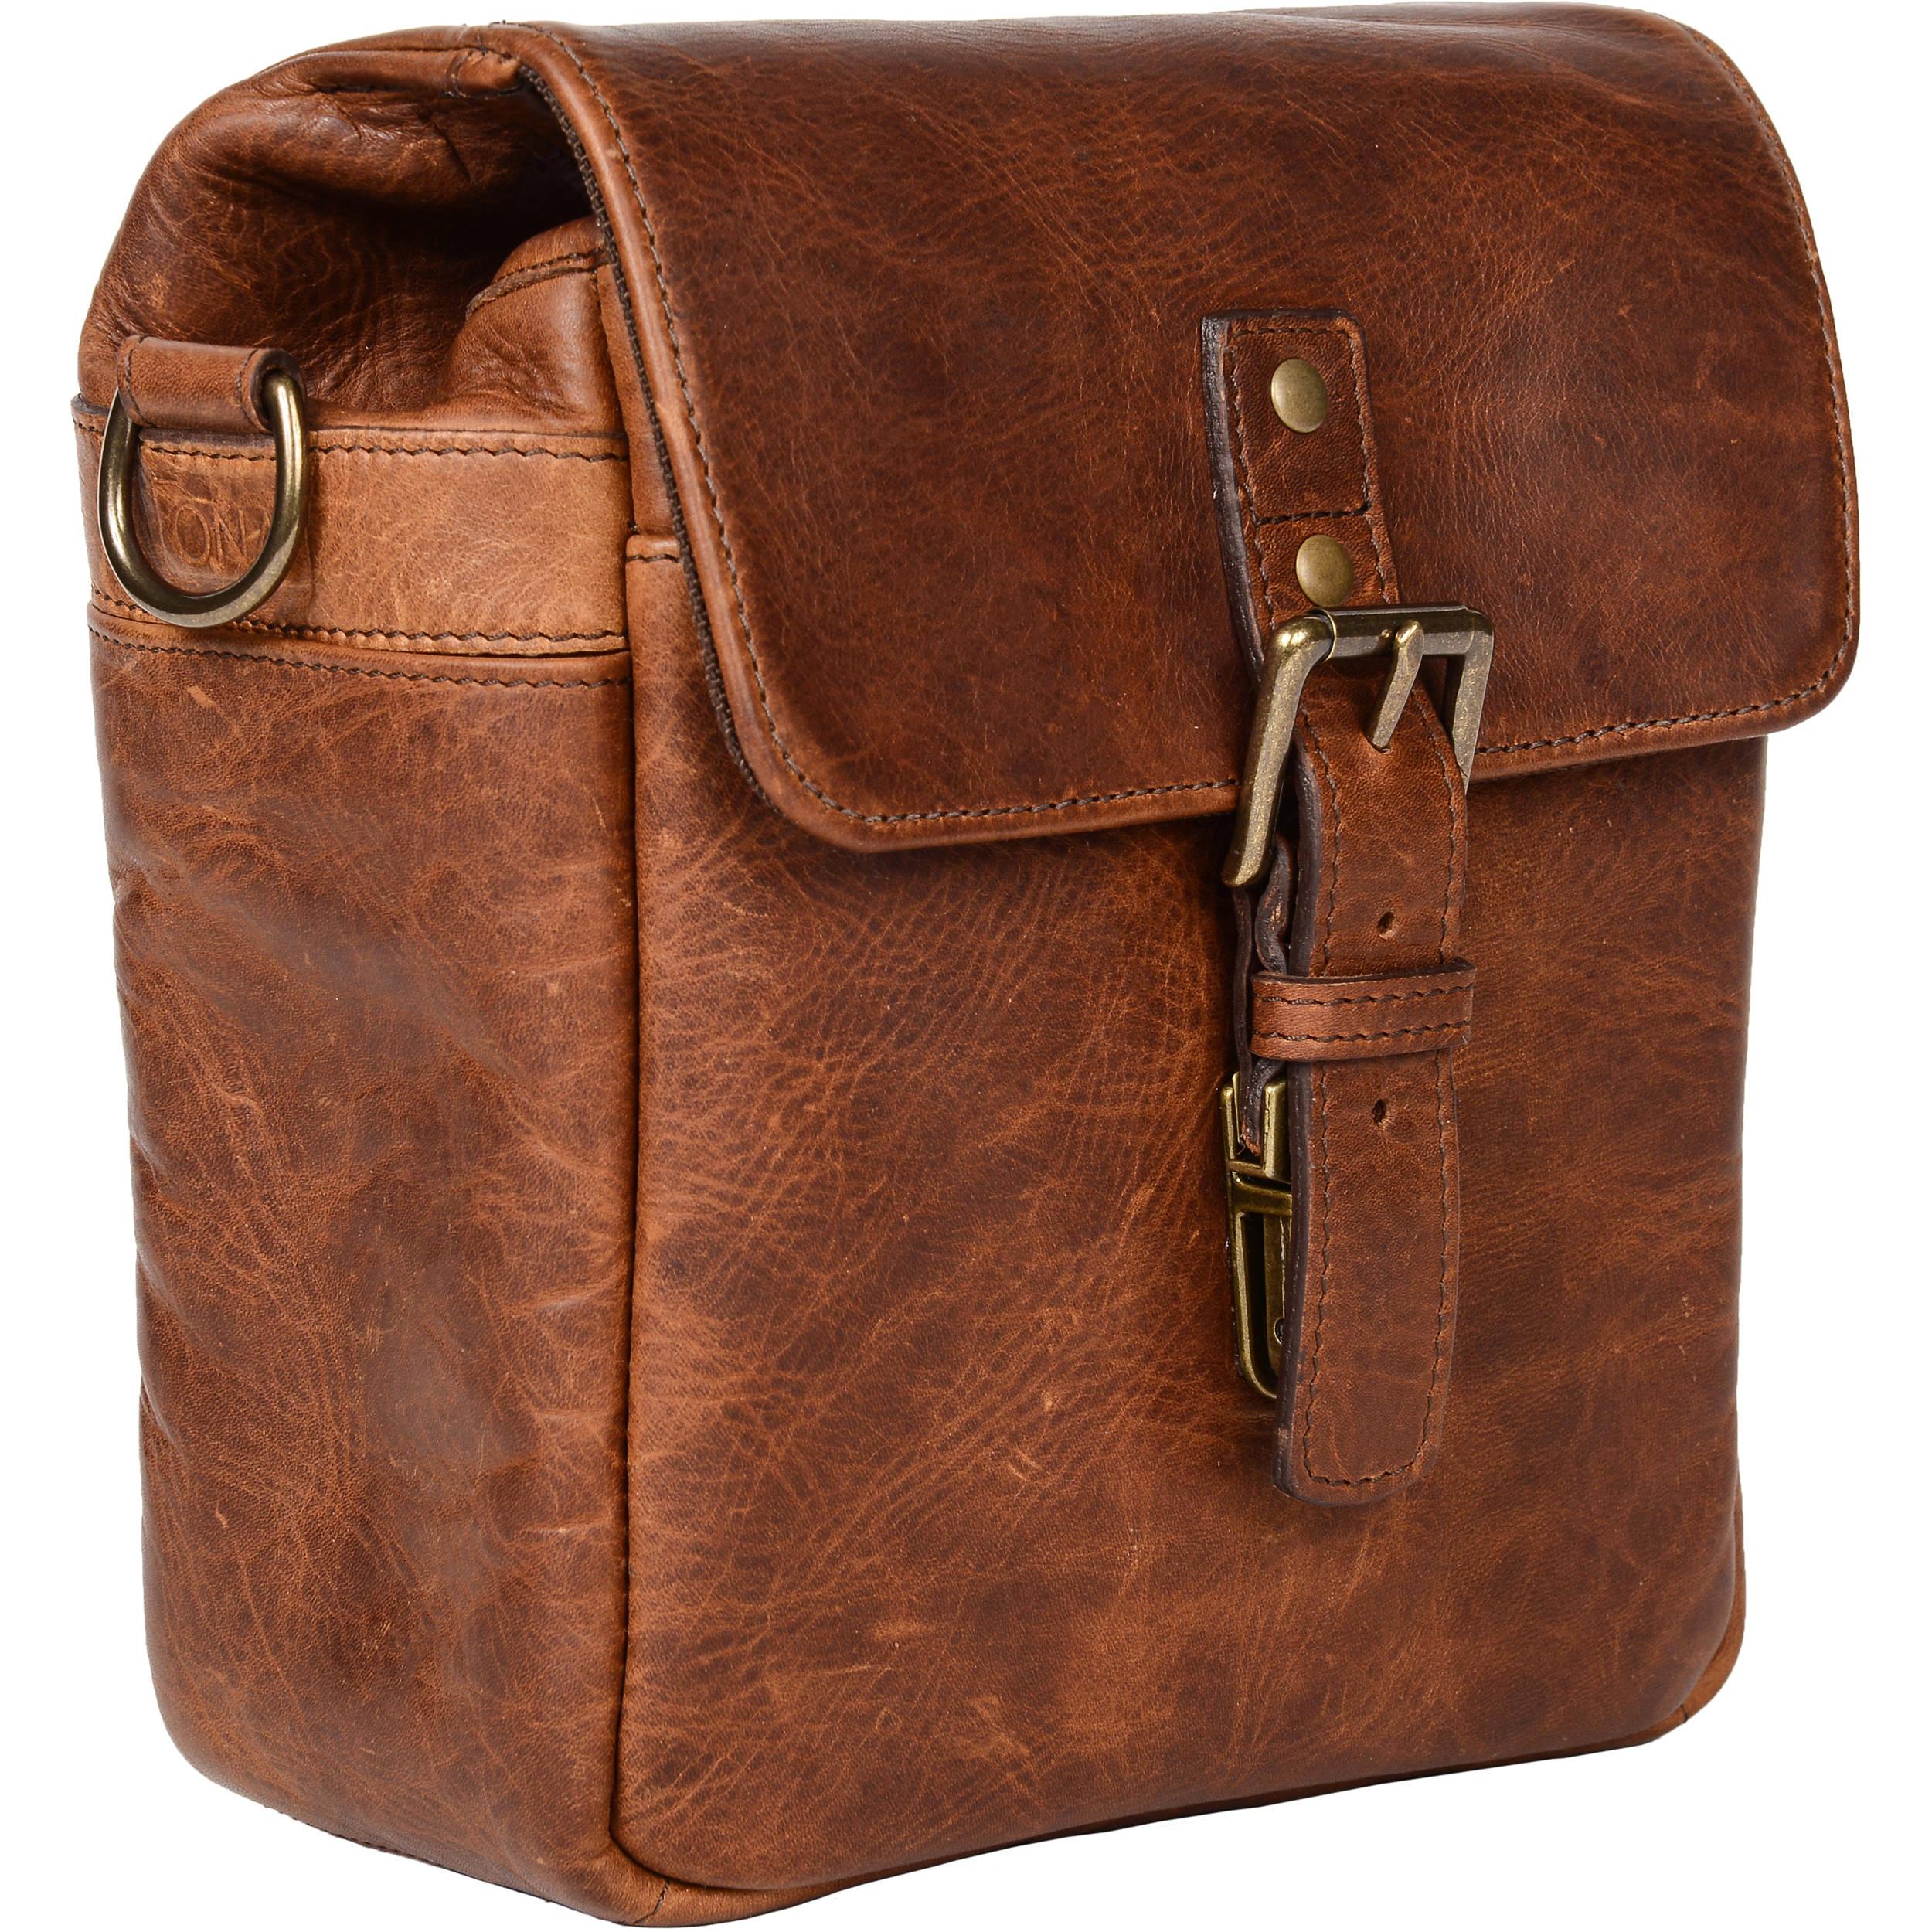 Ona Bond Street Leather Camera Bag Antique Cognac Ona5 064lbr